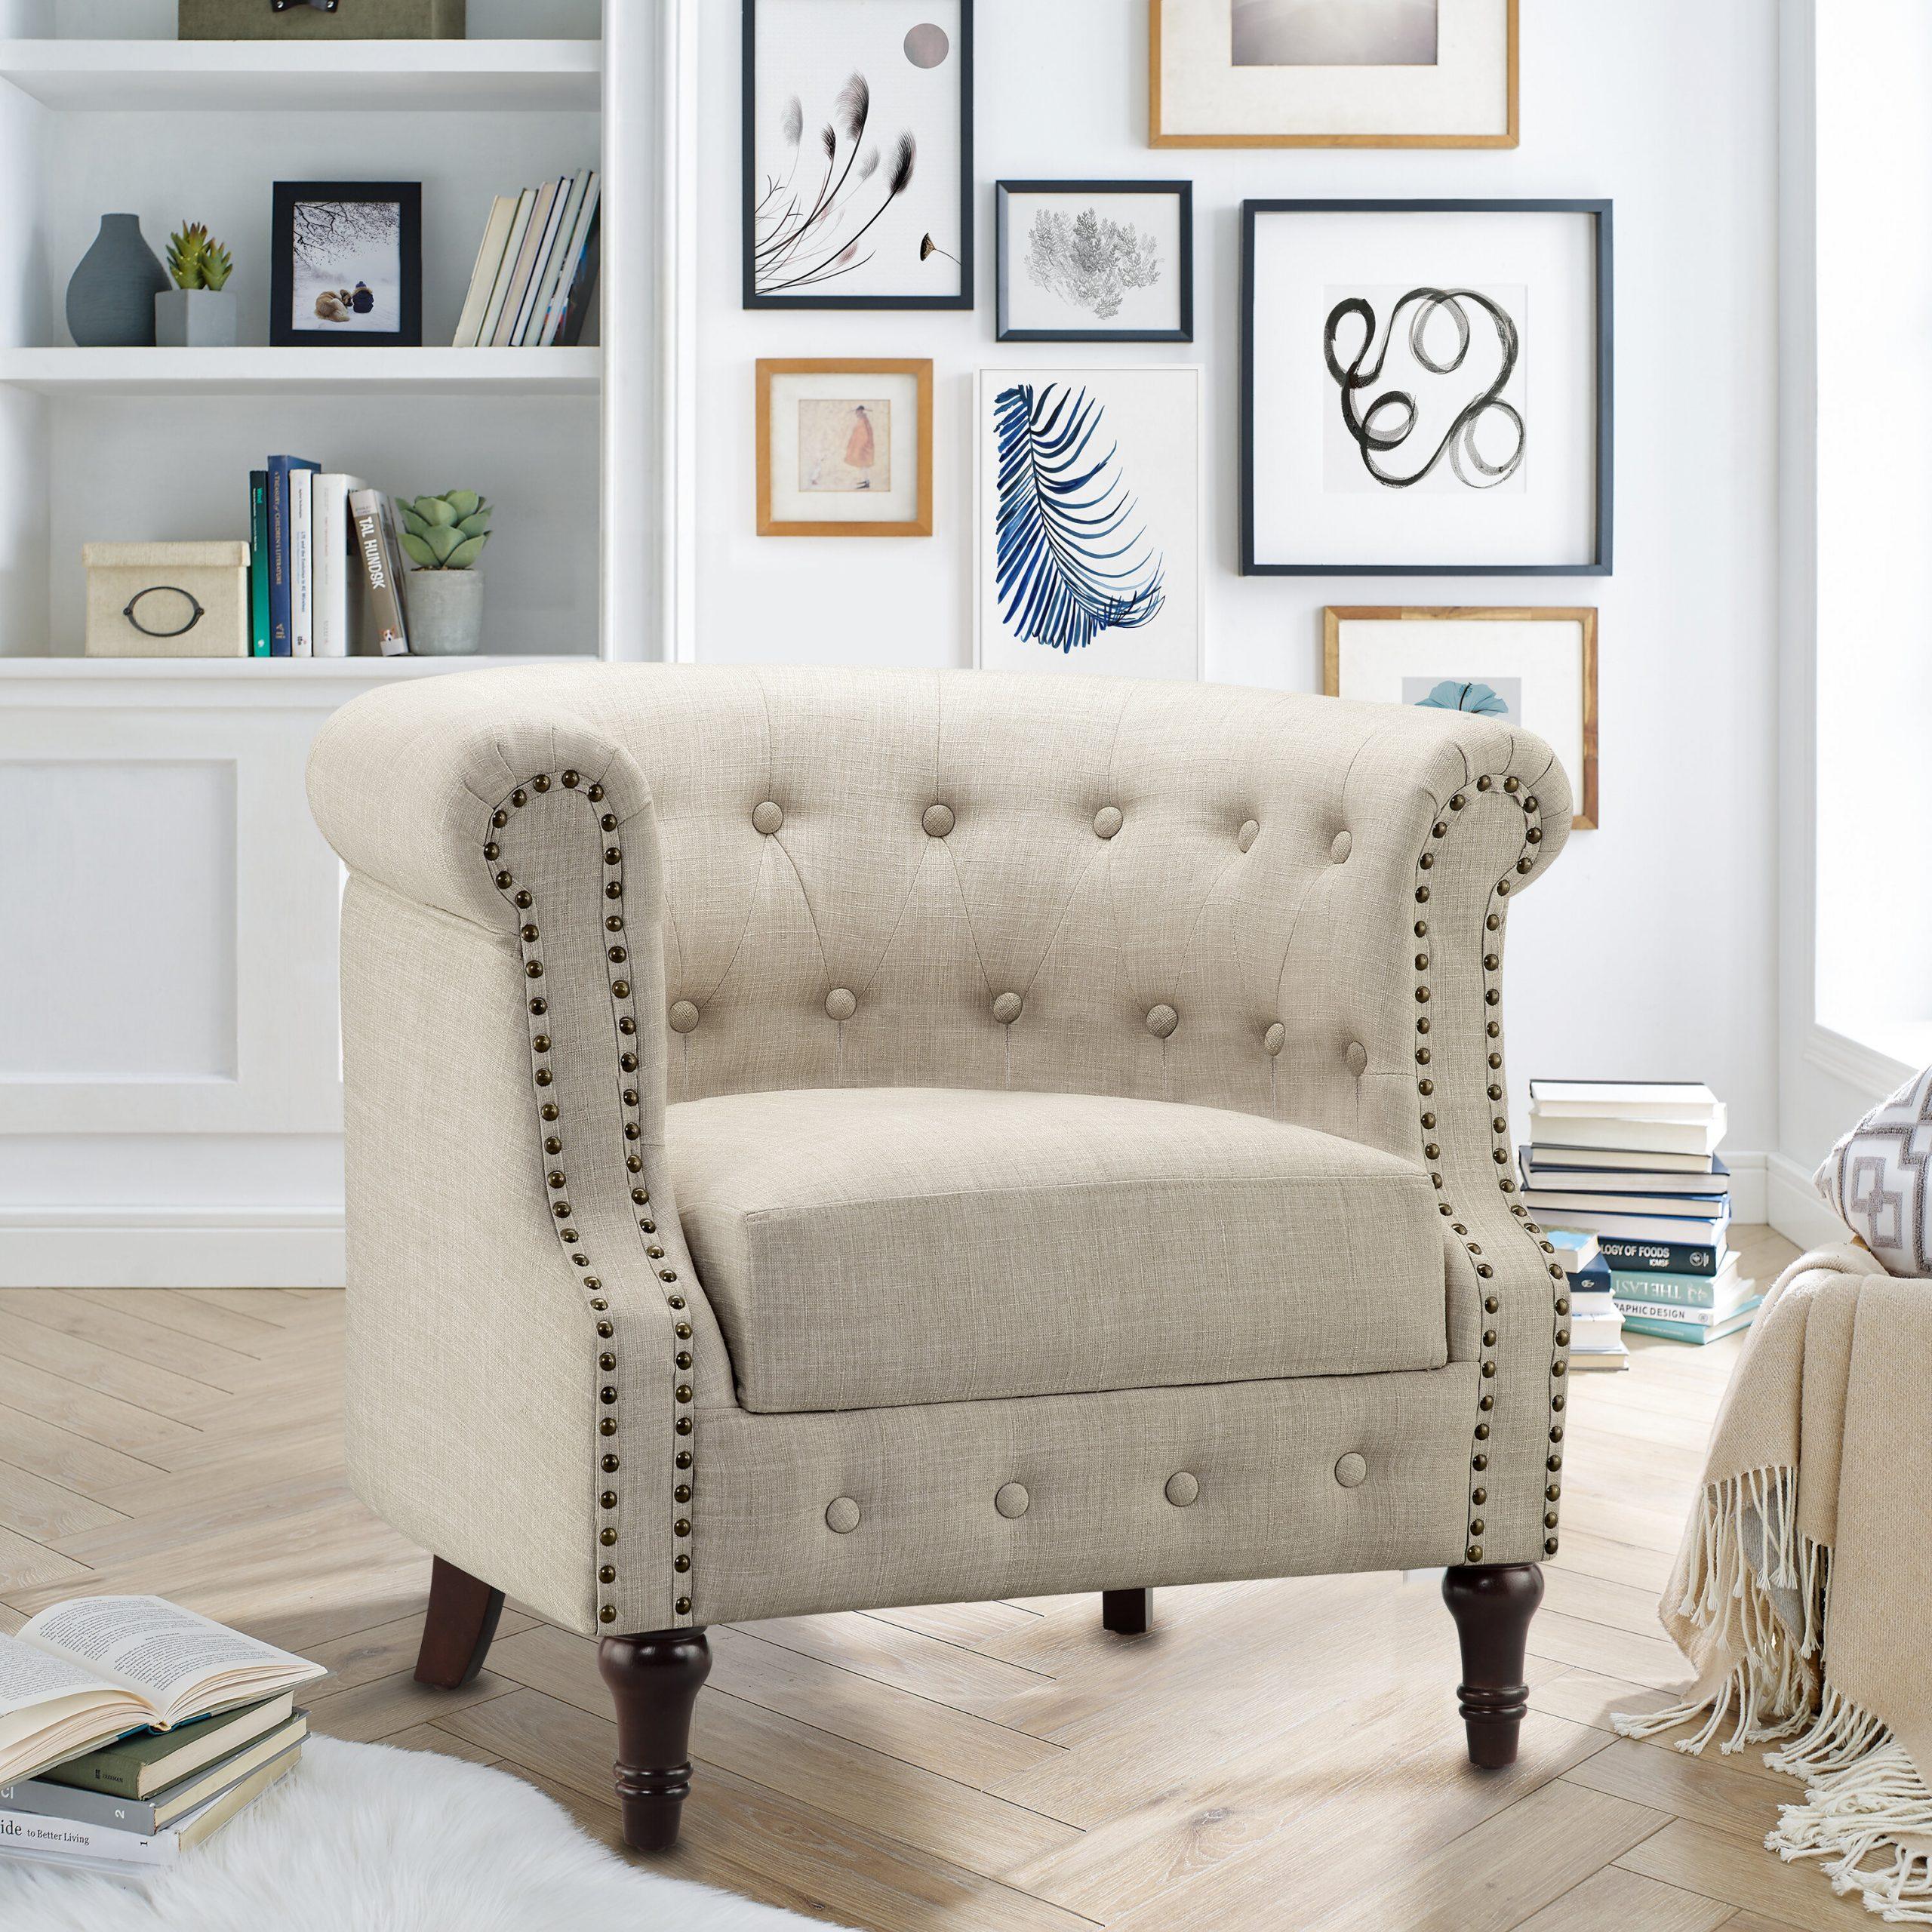 Featured Image of Kjellfrid Chesterfield Chairs